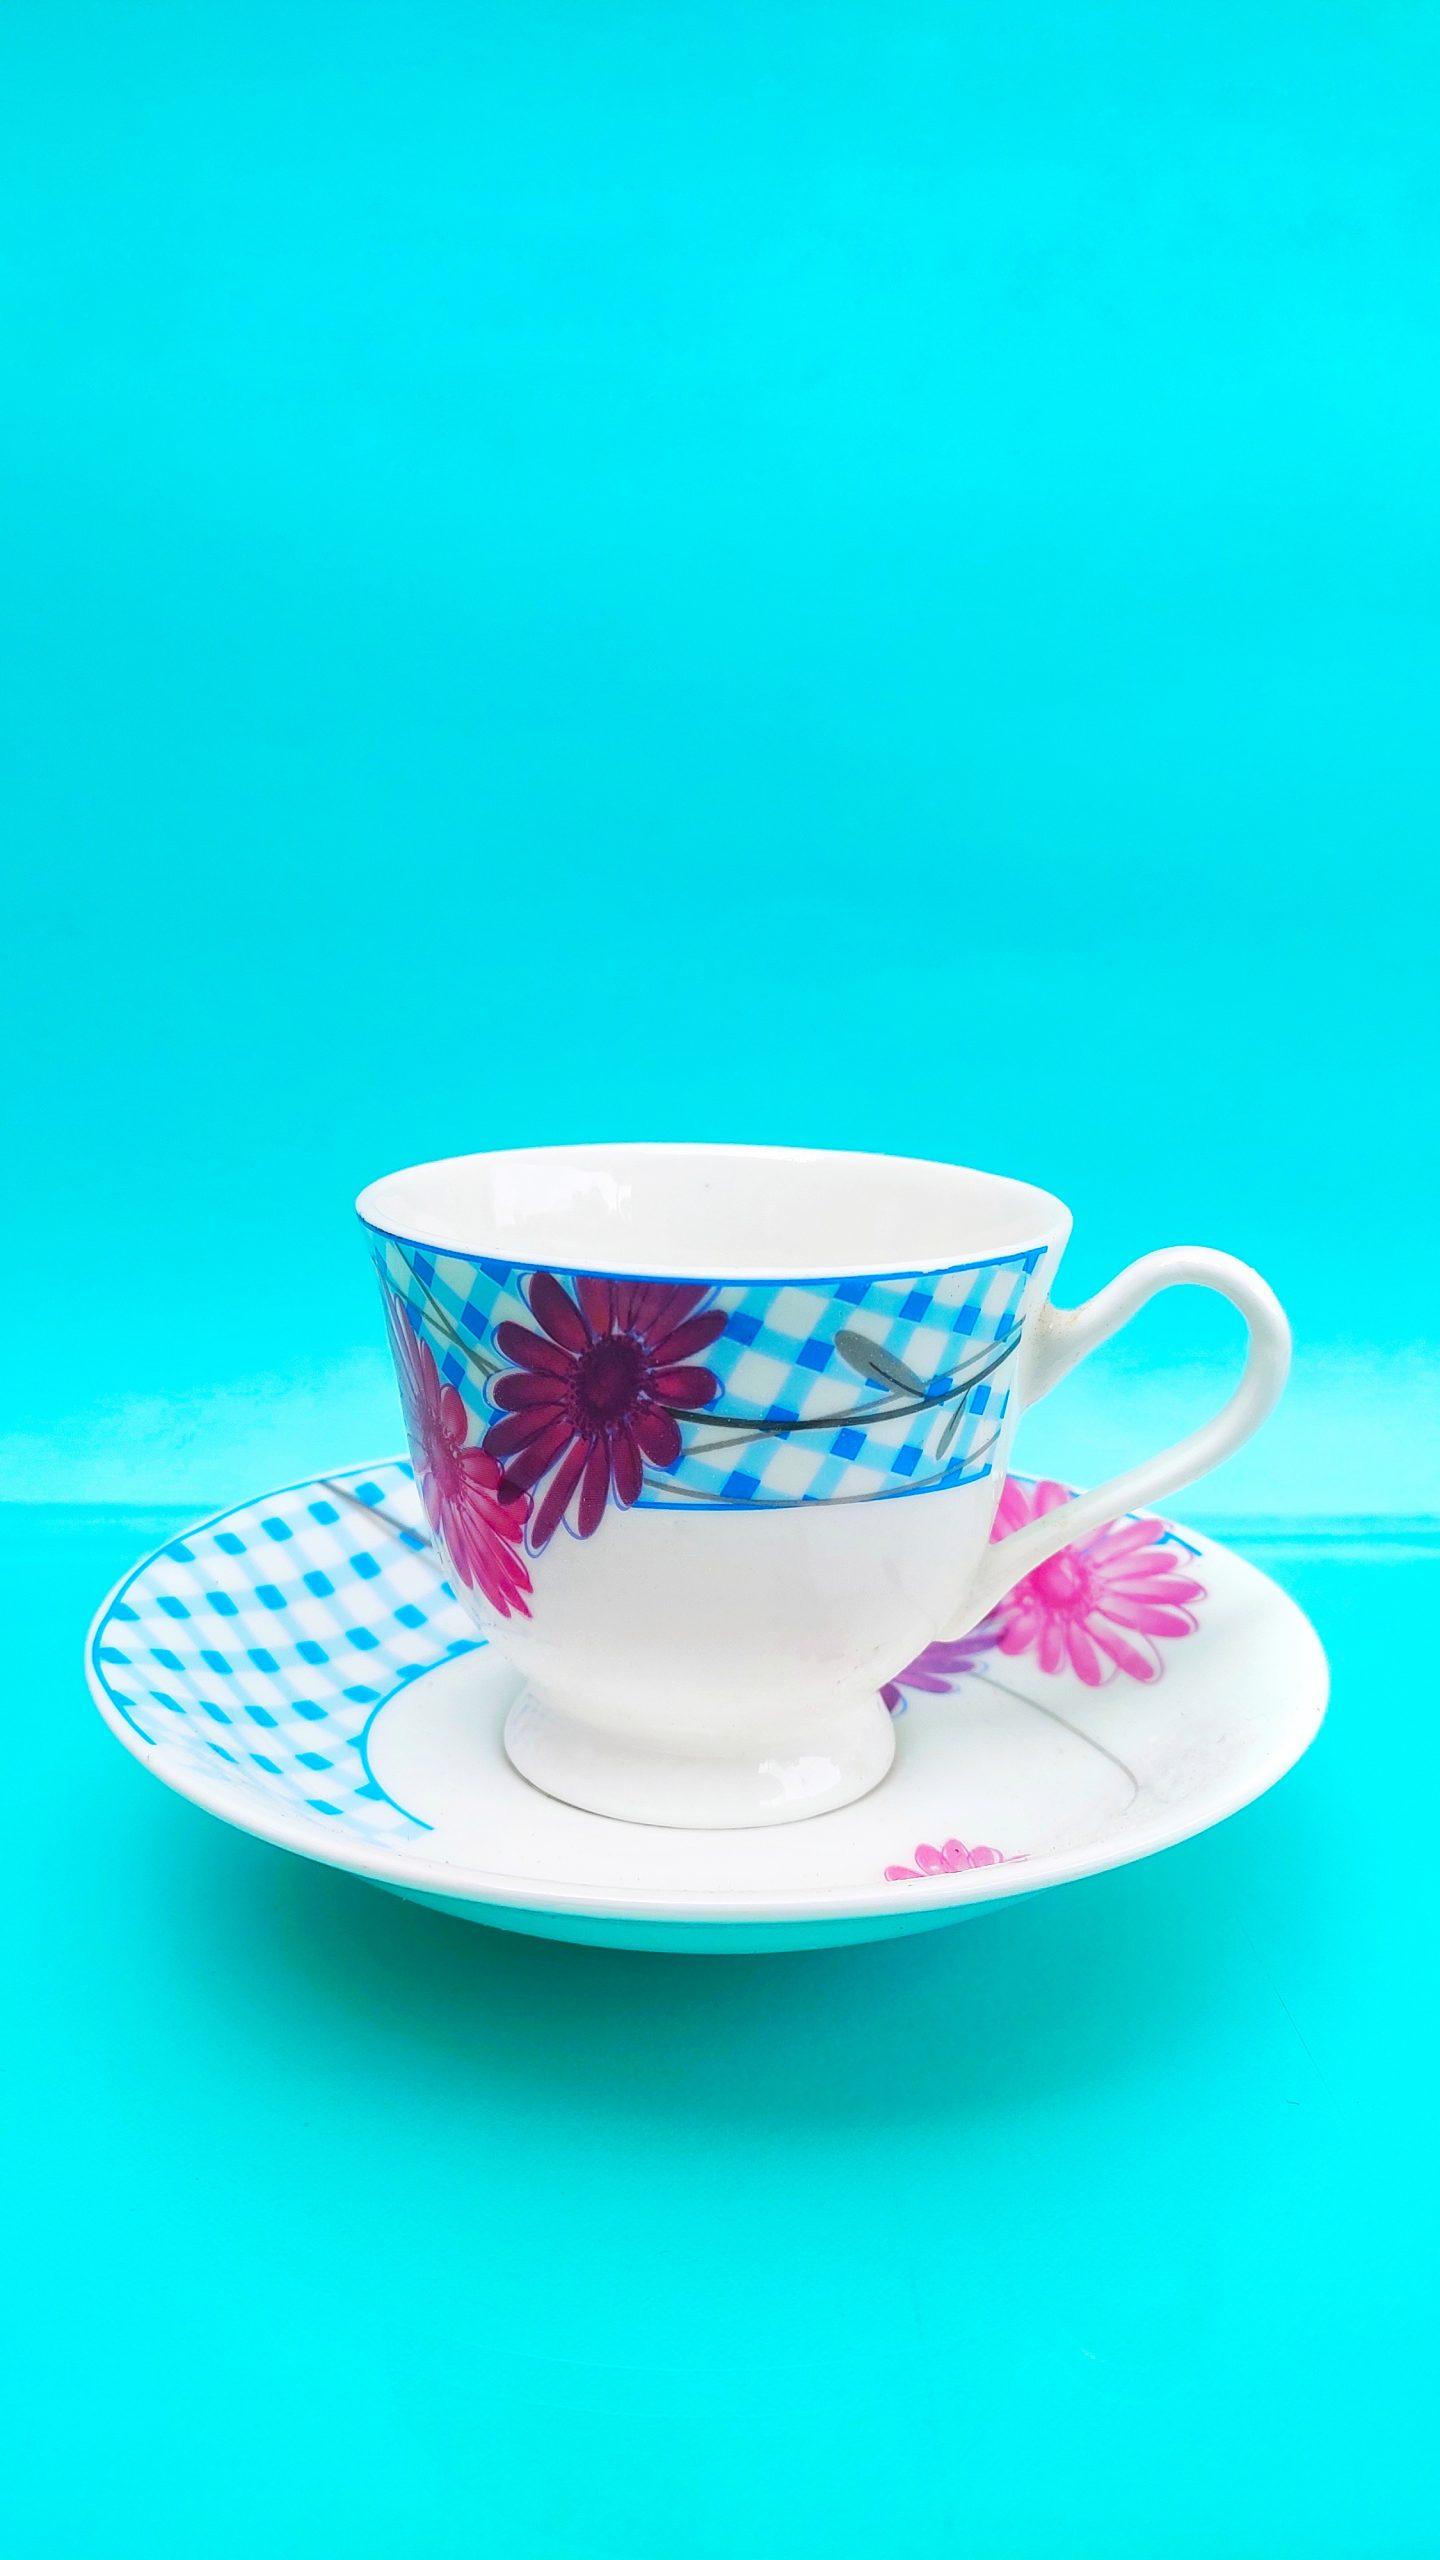 Tea Cup plate